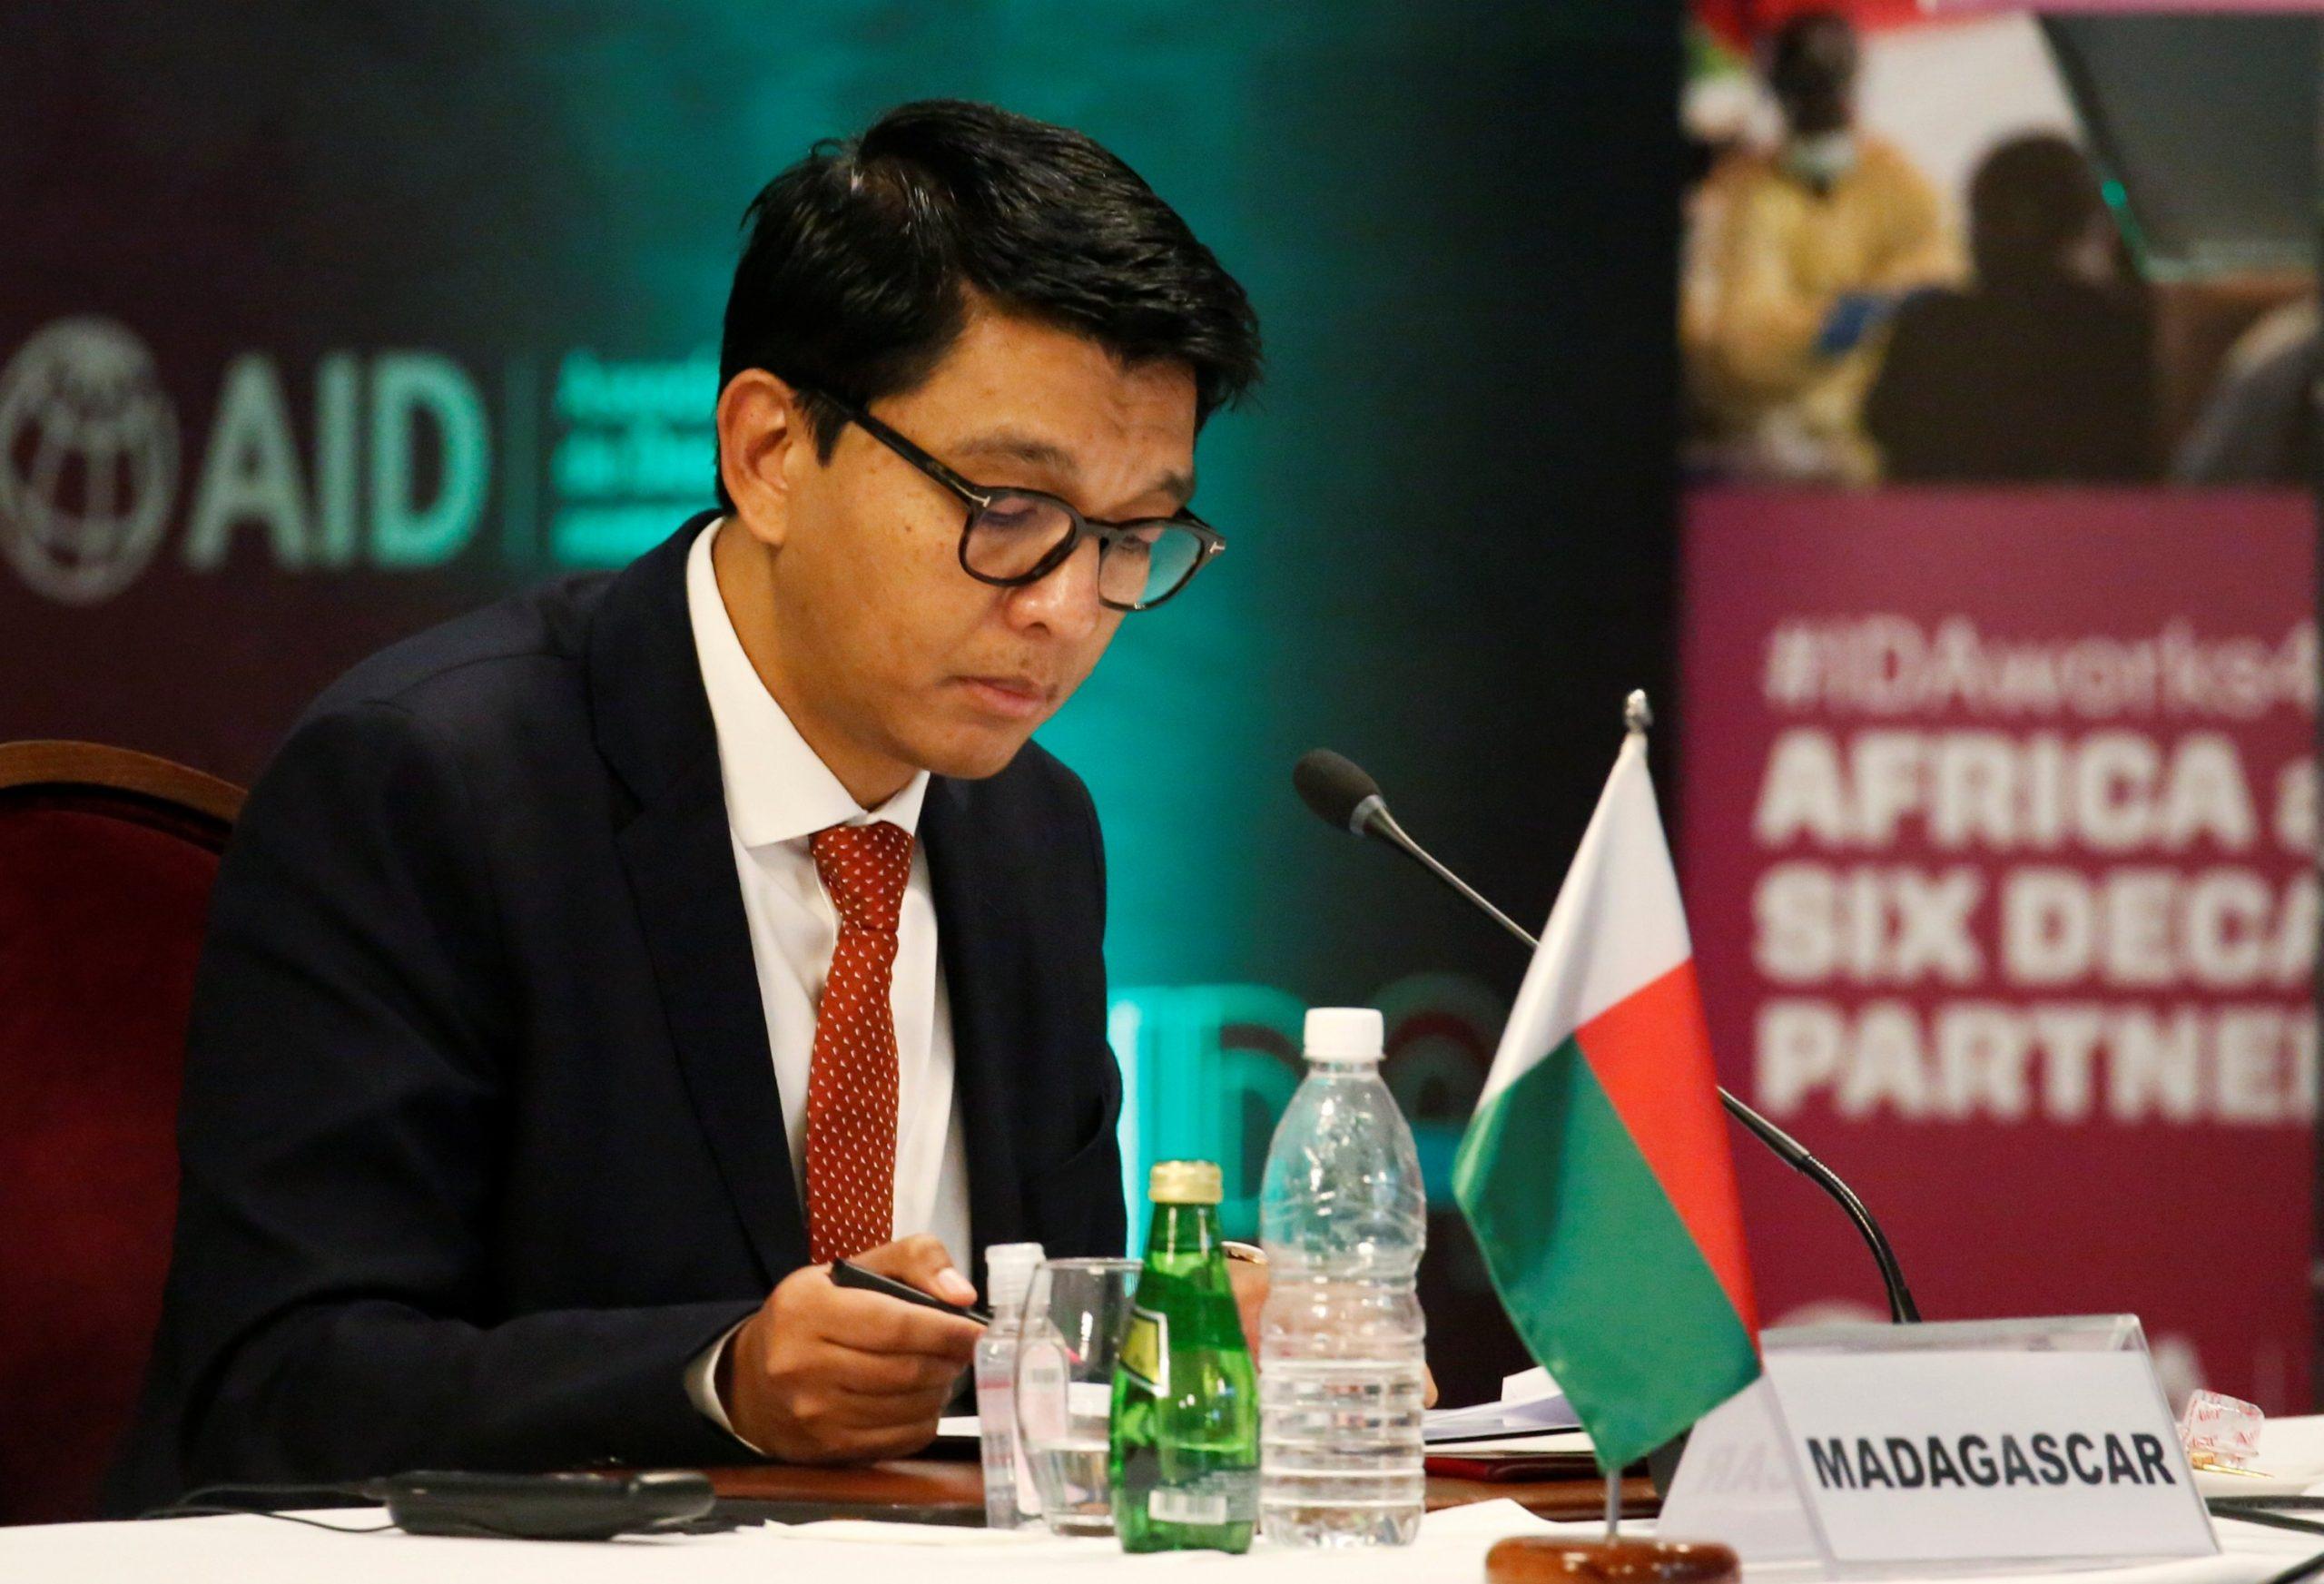 Madagascar president sacks all ministers. 46